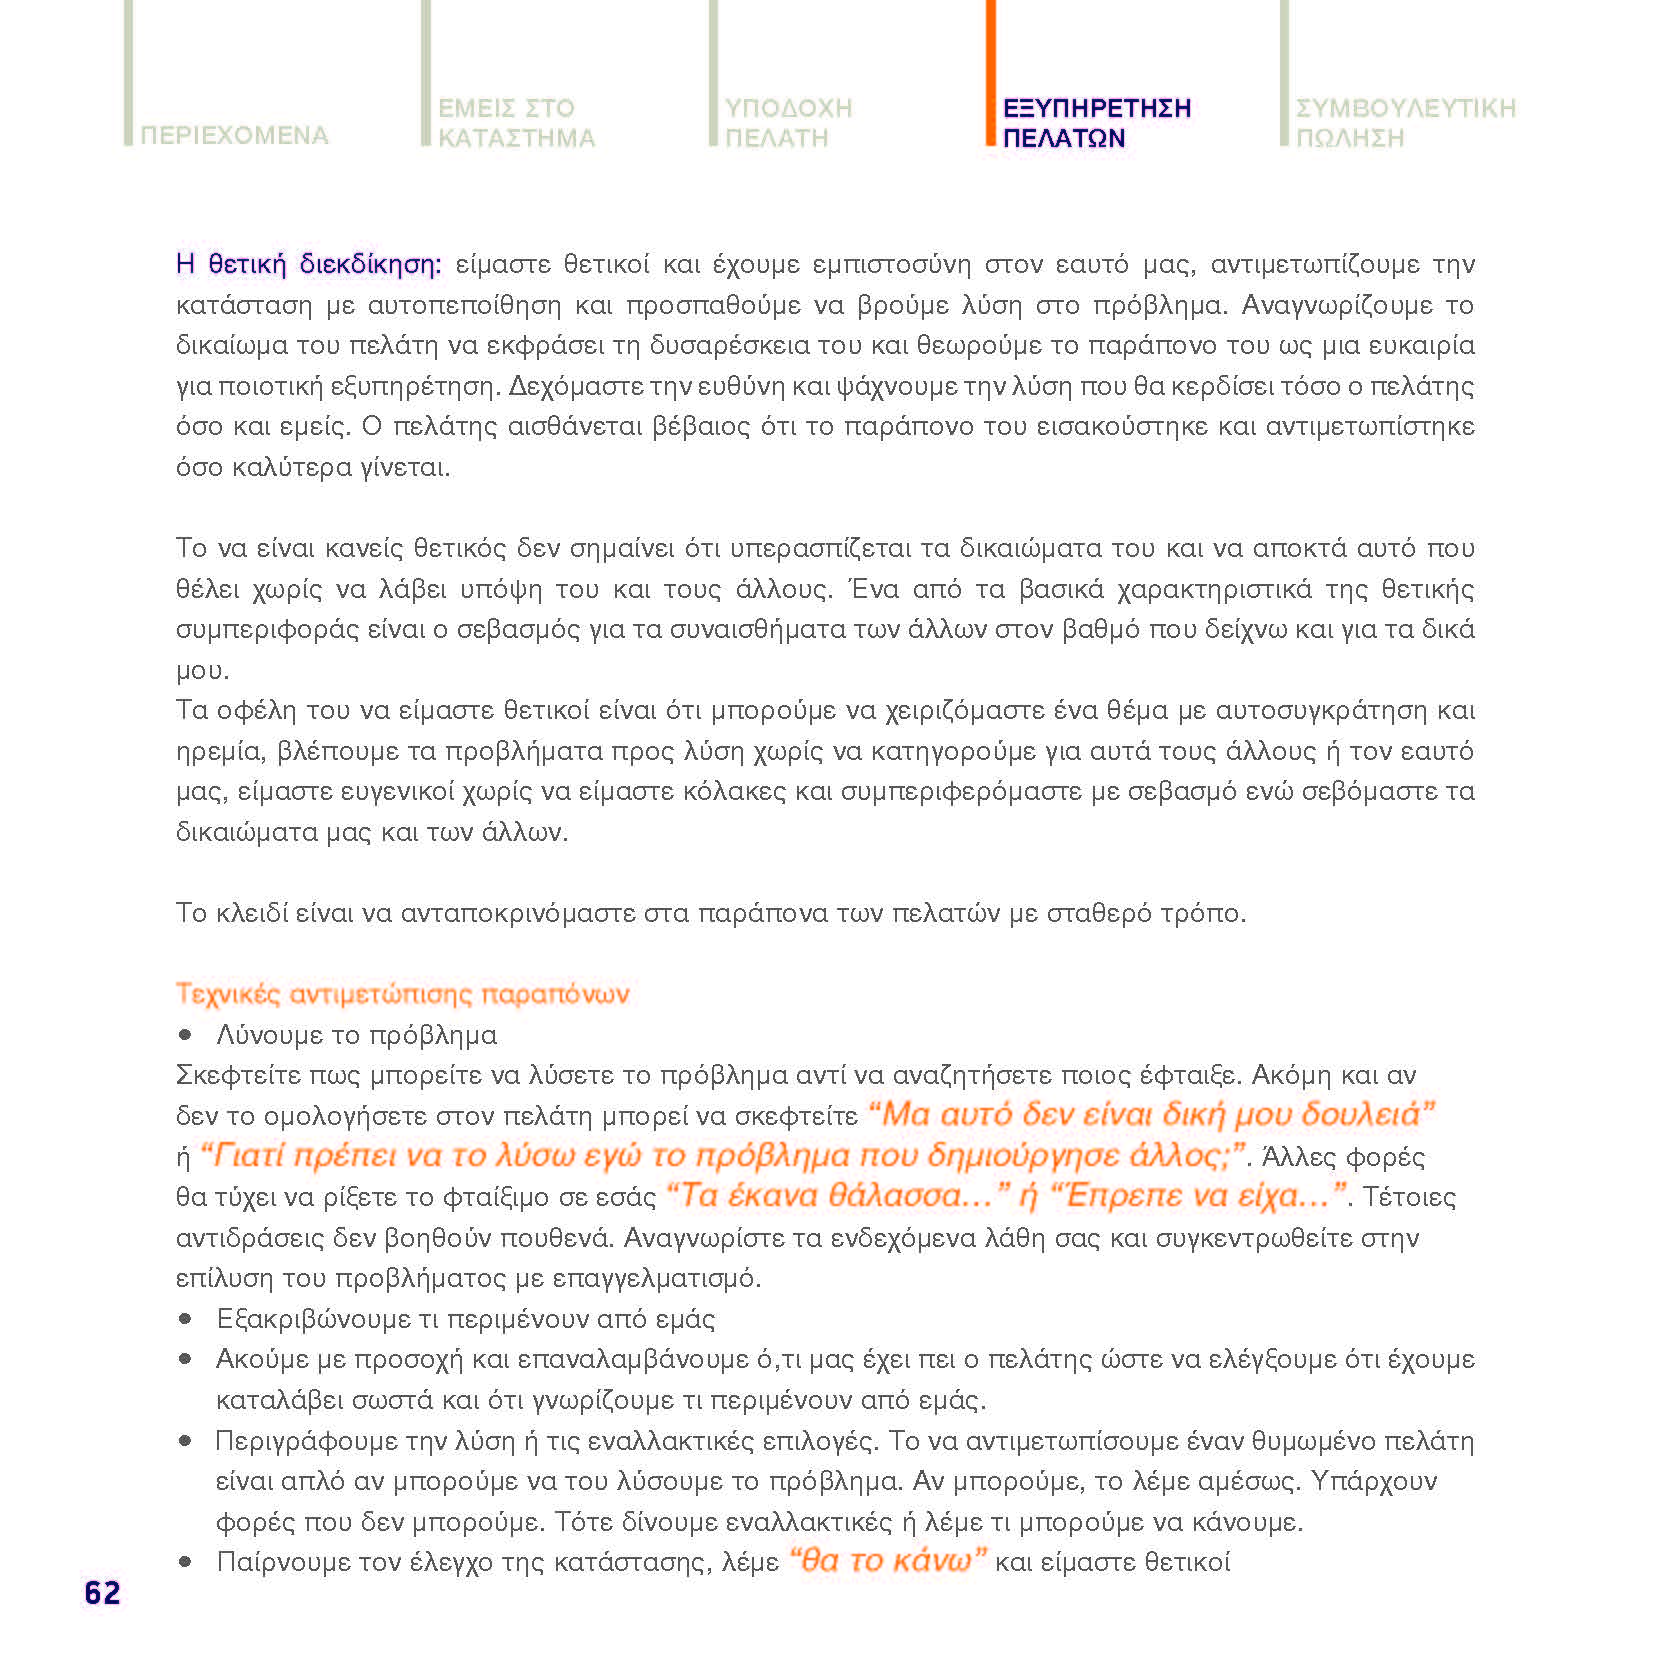 https://www.jib.gr/wp-content/uploads/2020/09/OPTIMA-BANK-BOOKLET-WEB_Page_062.jpg